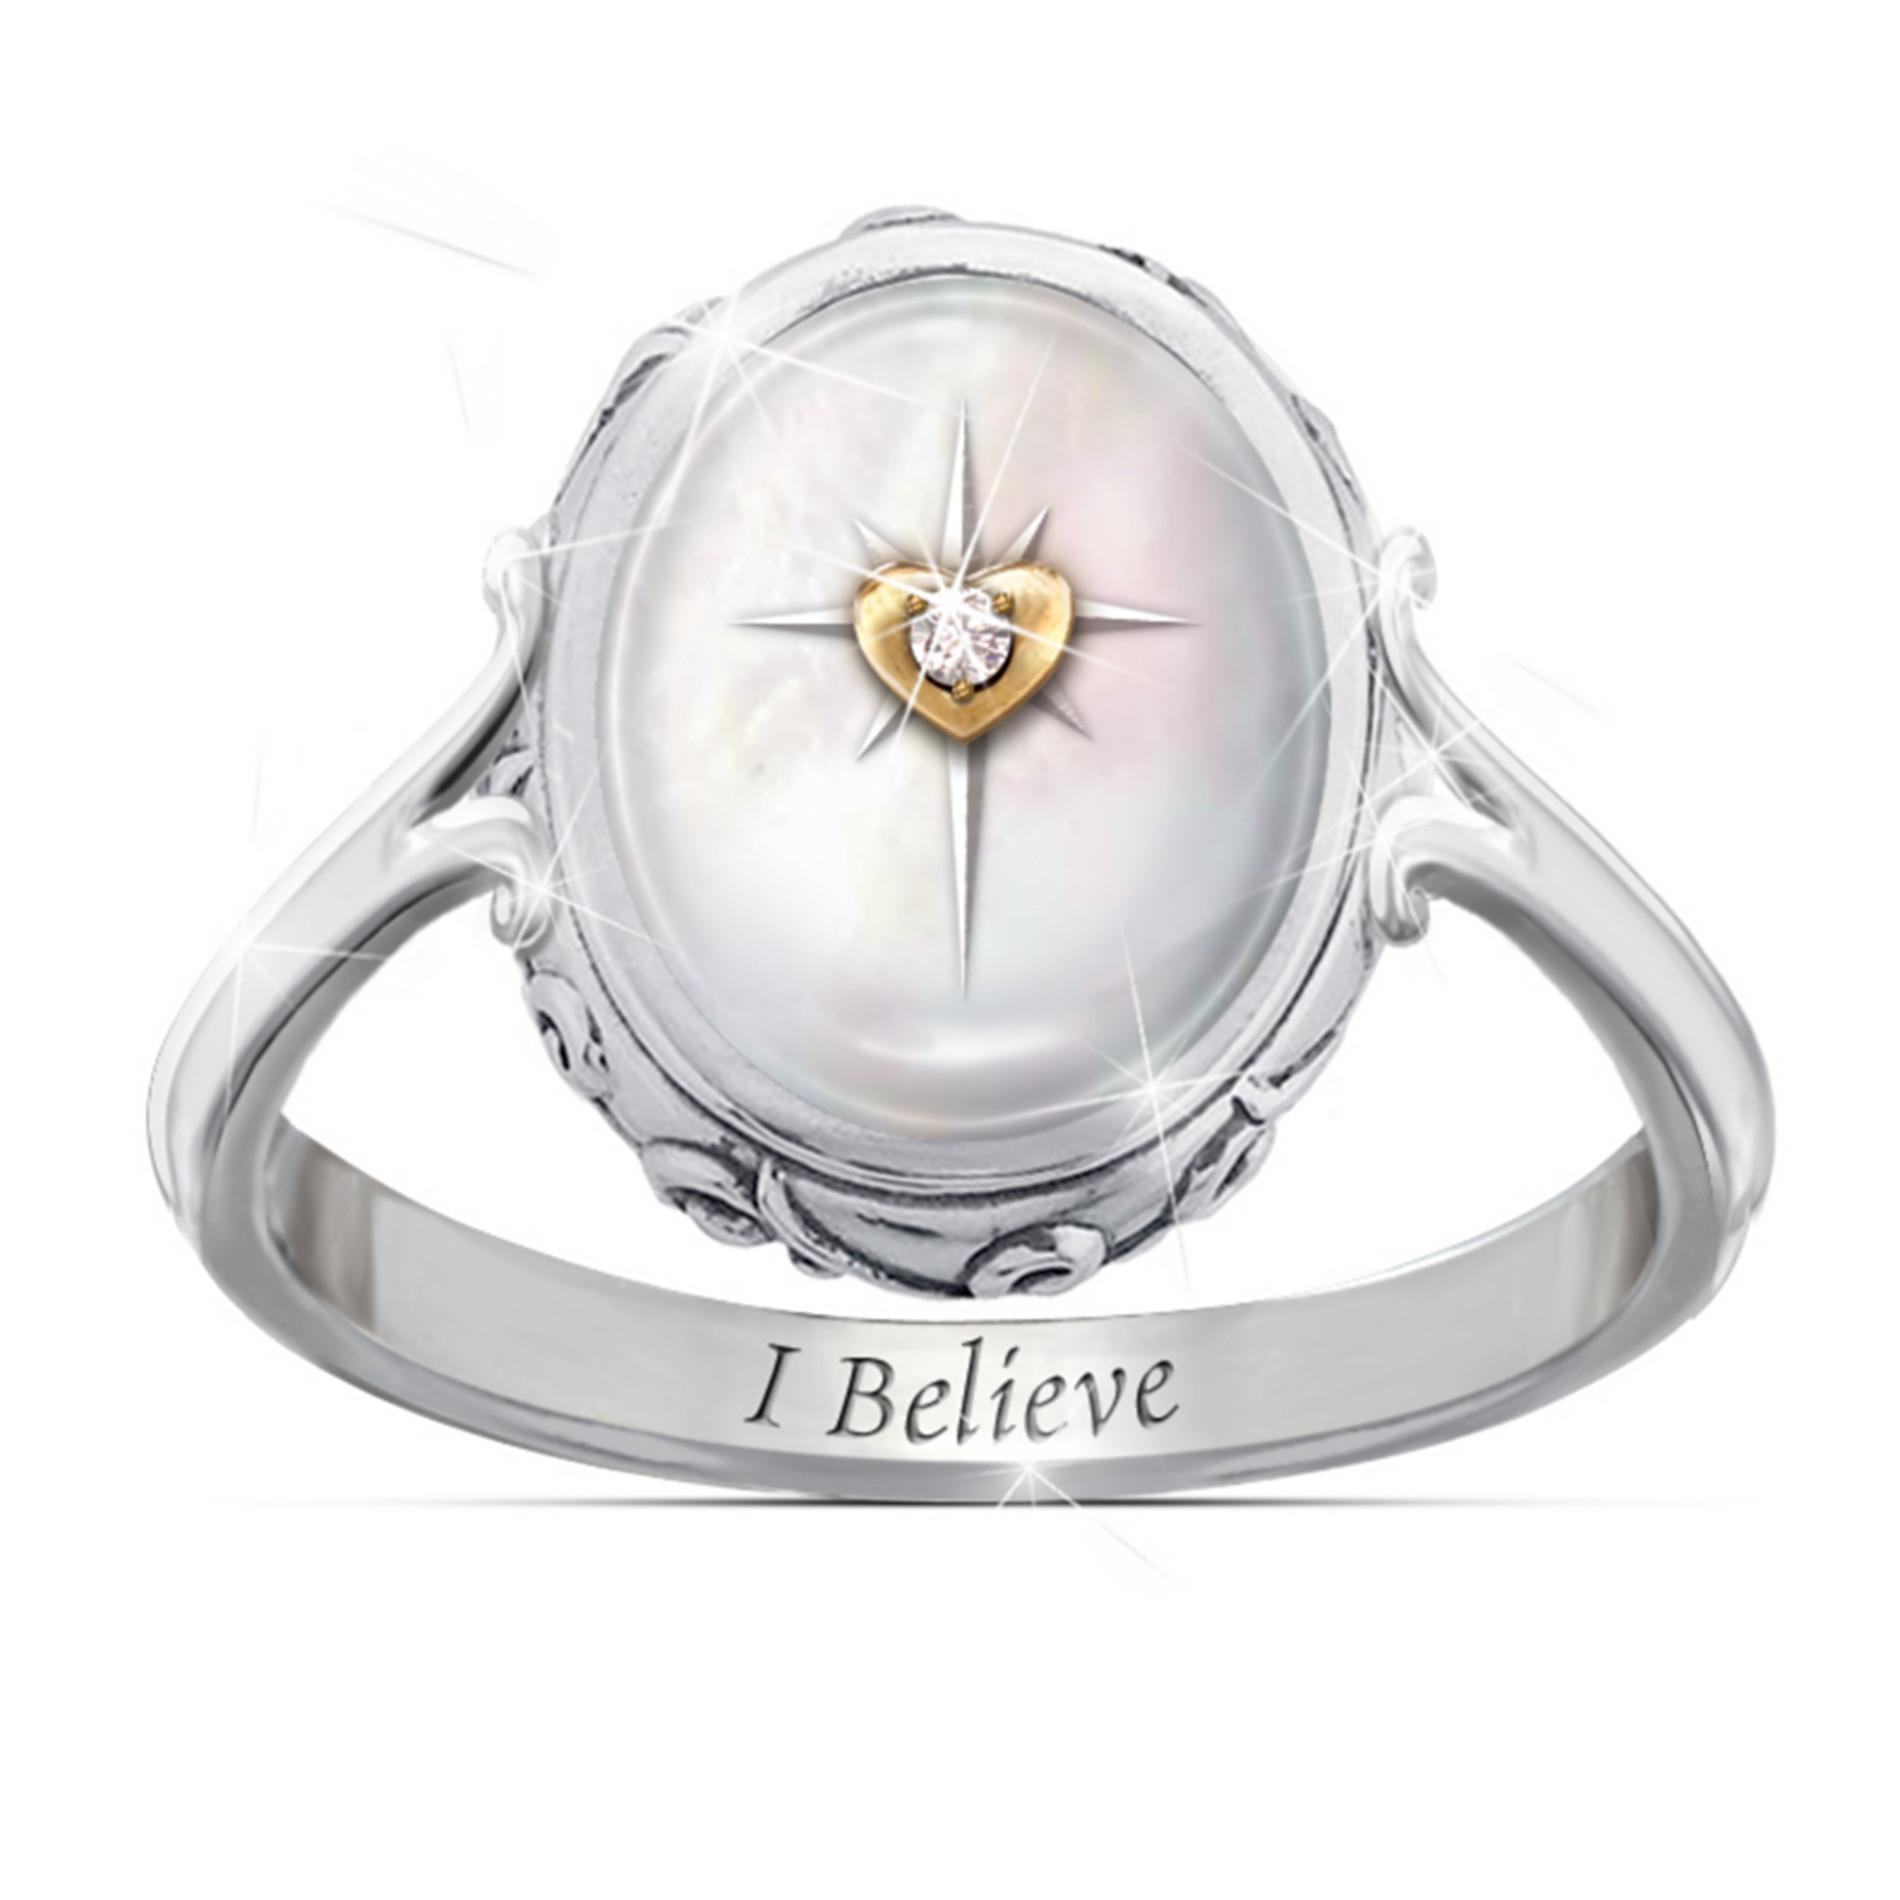 The Bradford Exchange U.S. Navy Men's Ring: For My Sailor